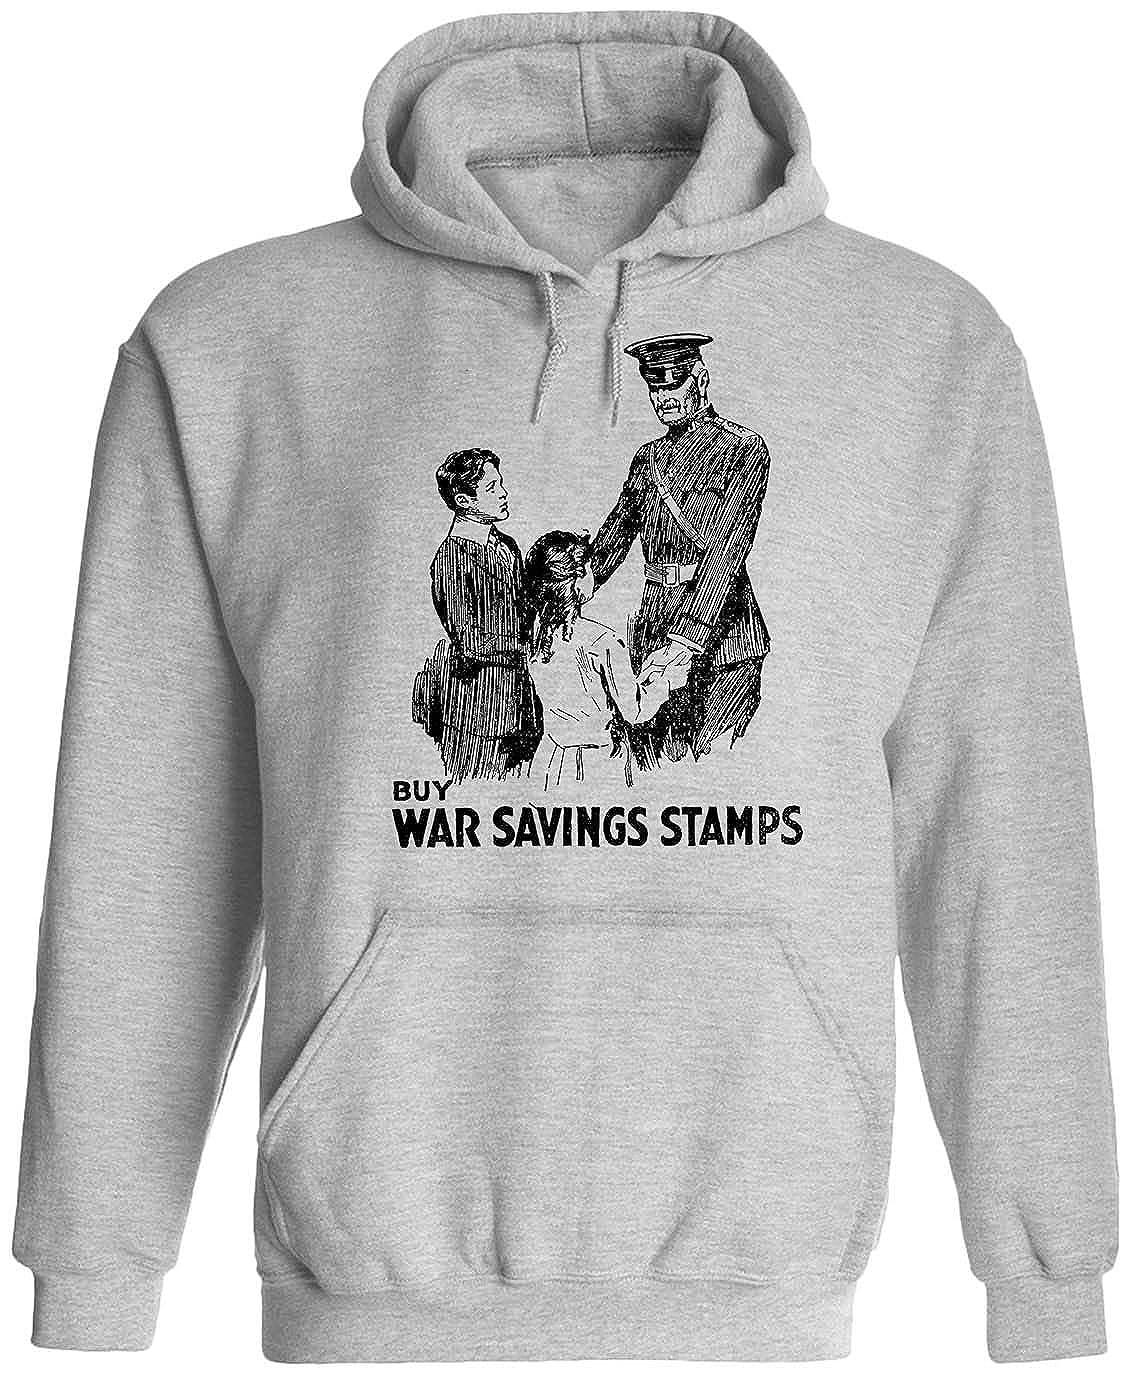 Austin Ink Apparel War Stamps Poster Unisex Adult Hooded Pullover Sweatshirt